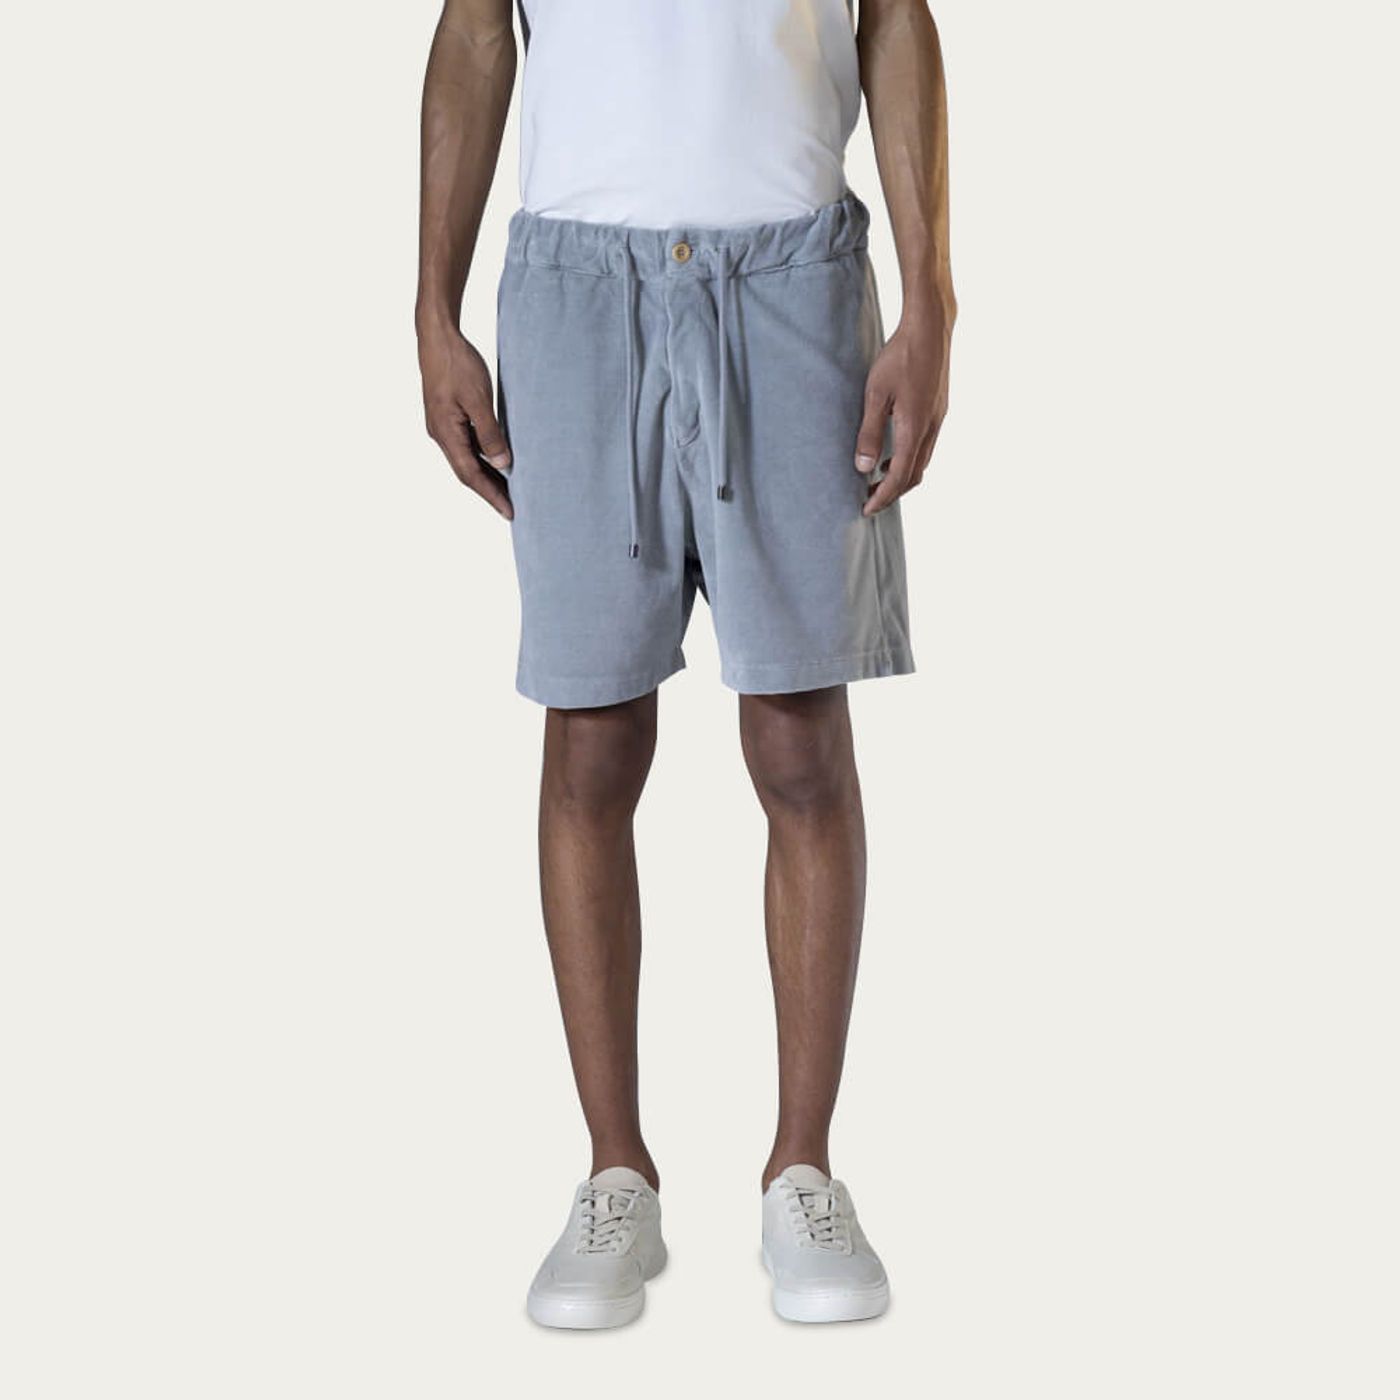 Grey Bermuda Sport Shorts | Bombinate